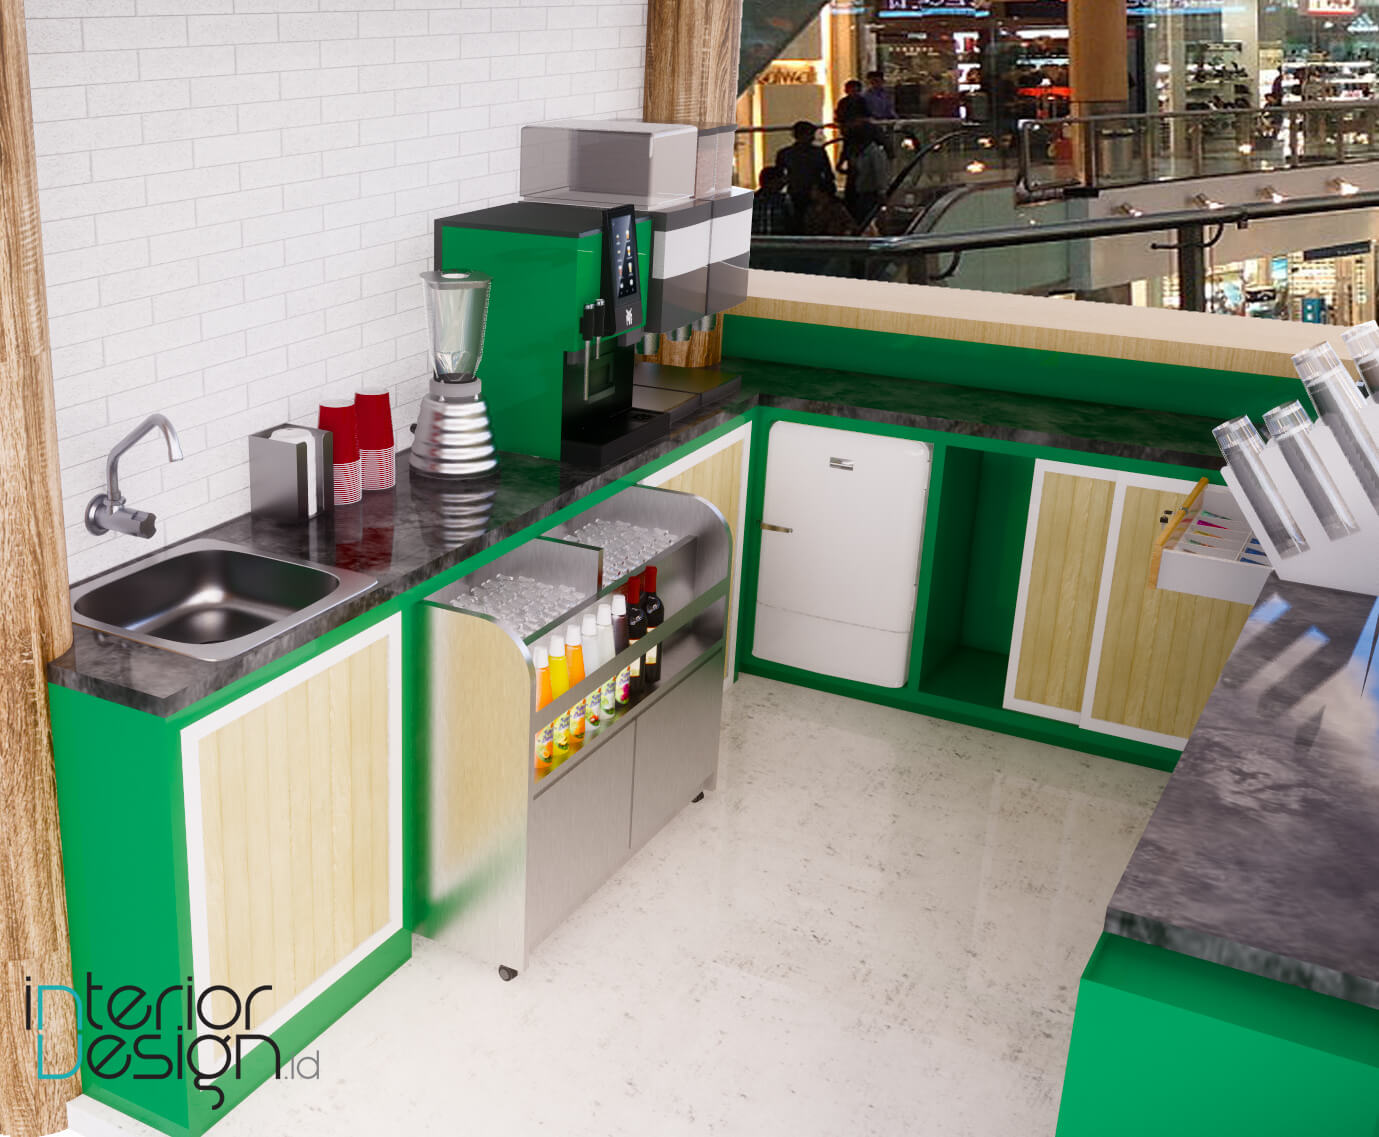 Jasa desain interior toko